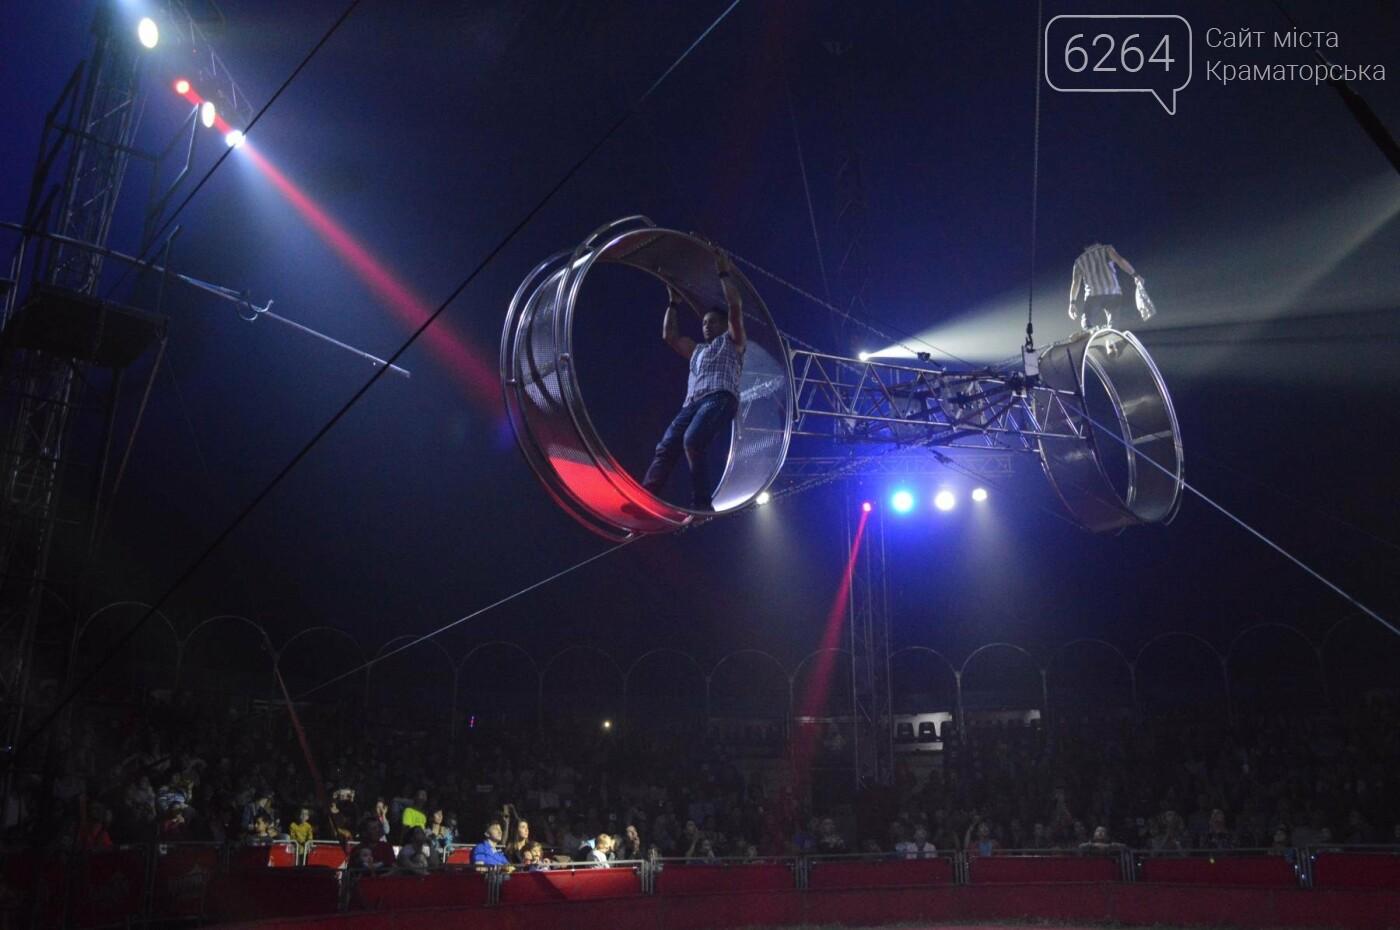 Новое шоу цирка «Кобзов» произвело фурор в Краматорске, фото-10